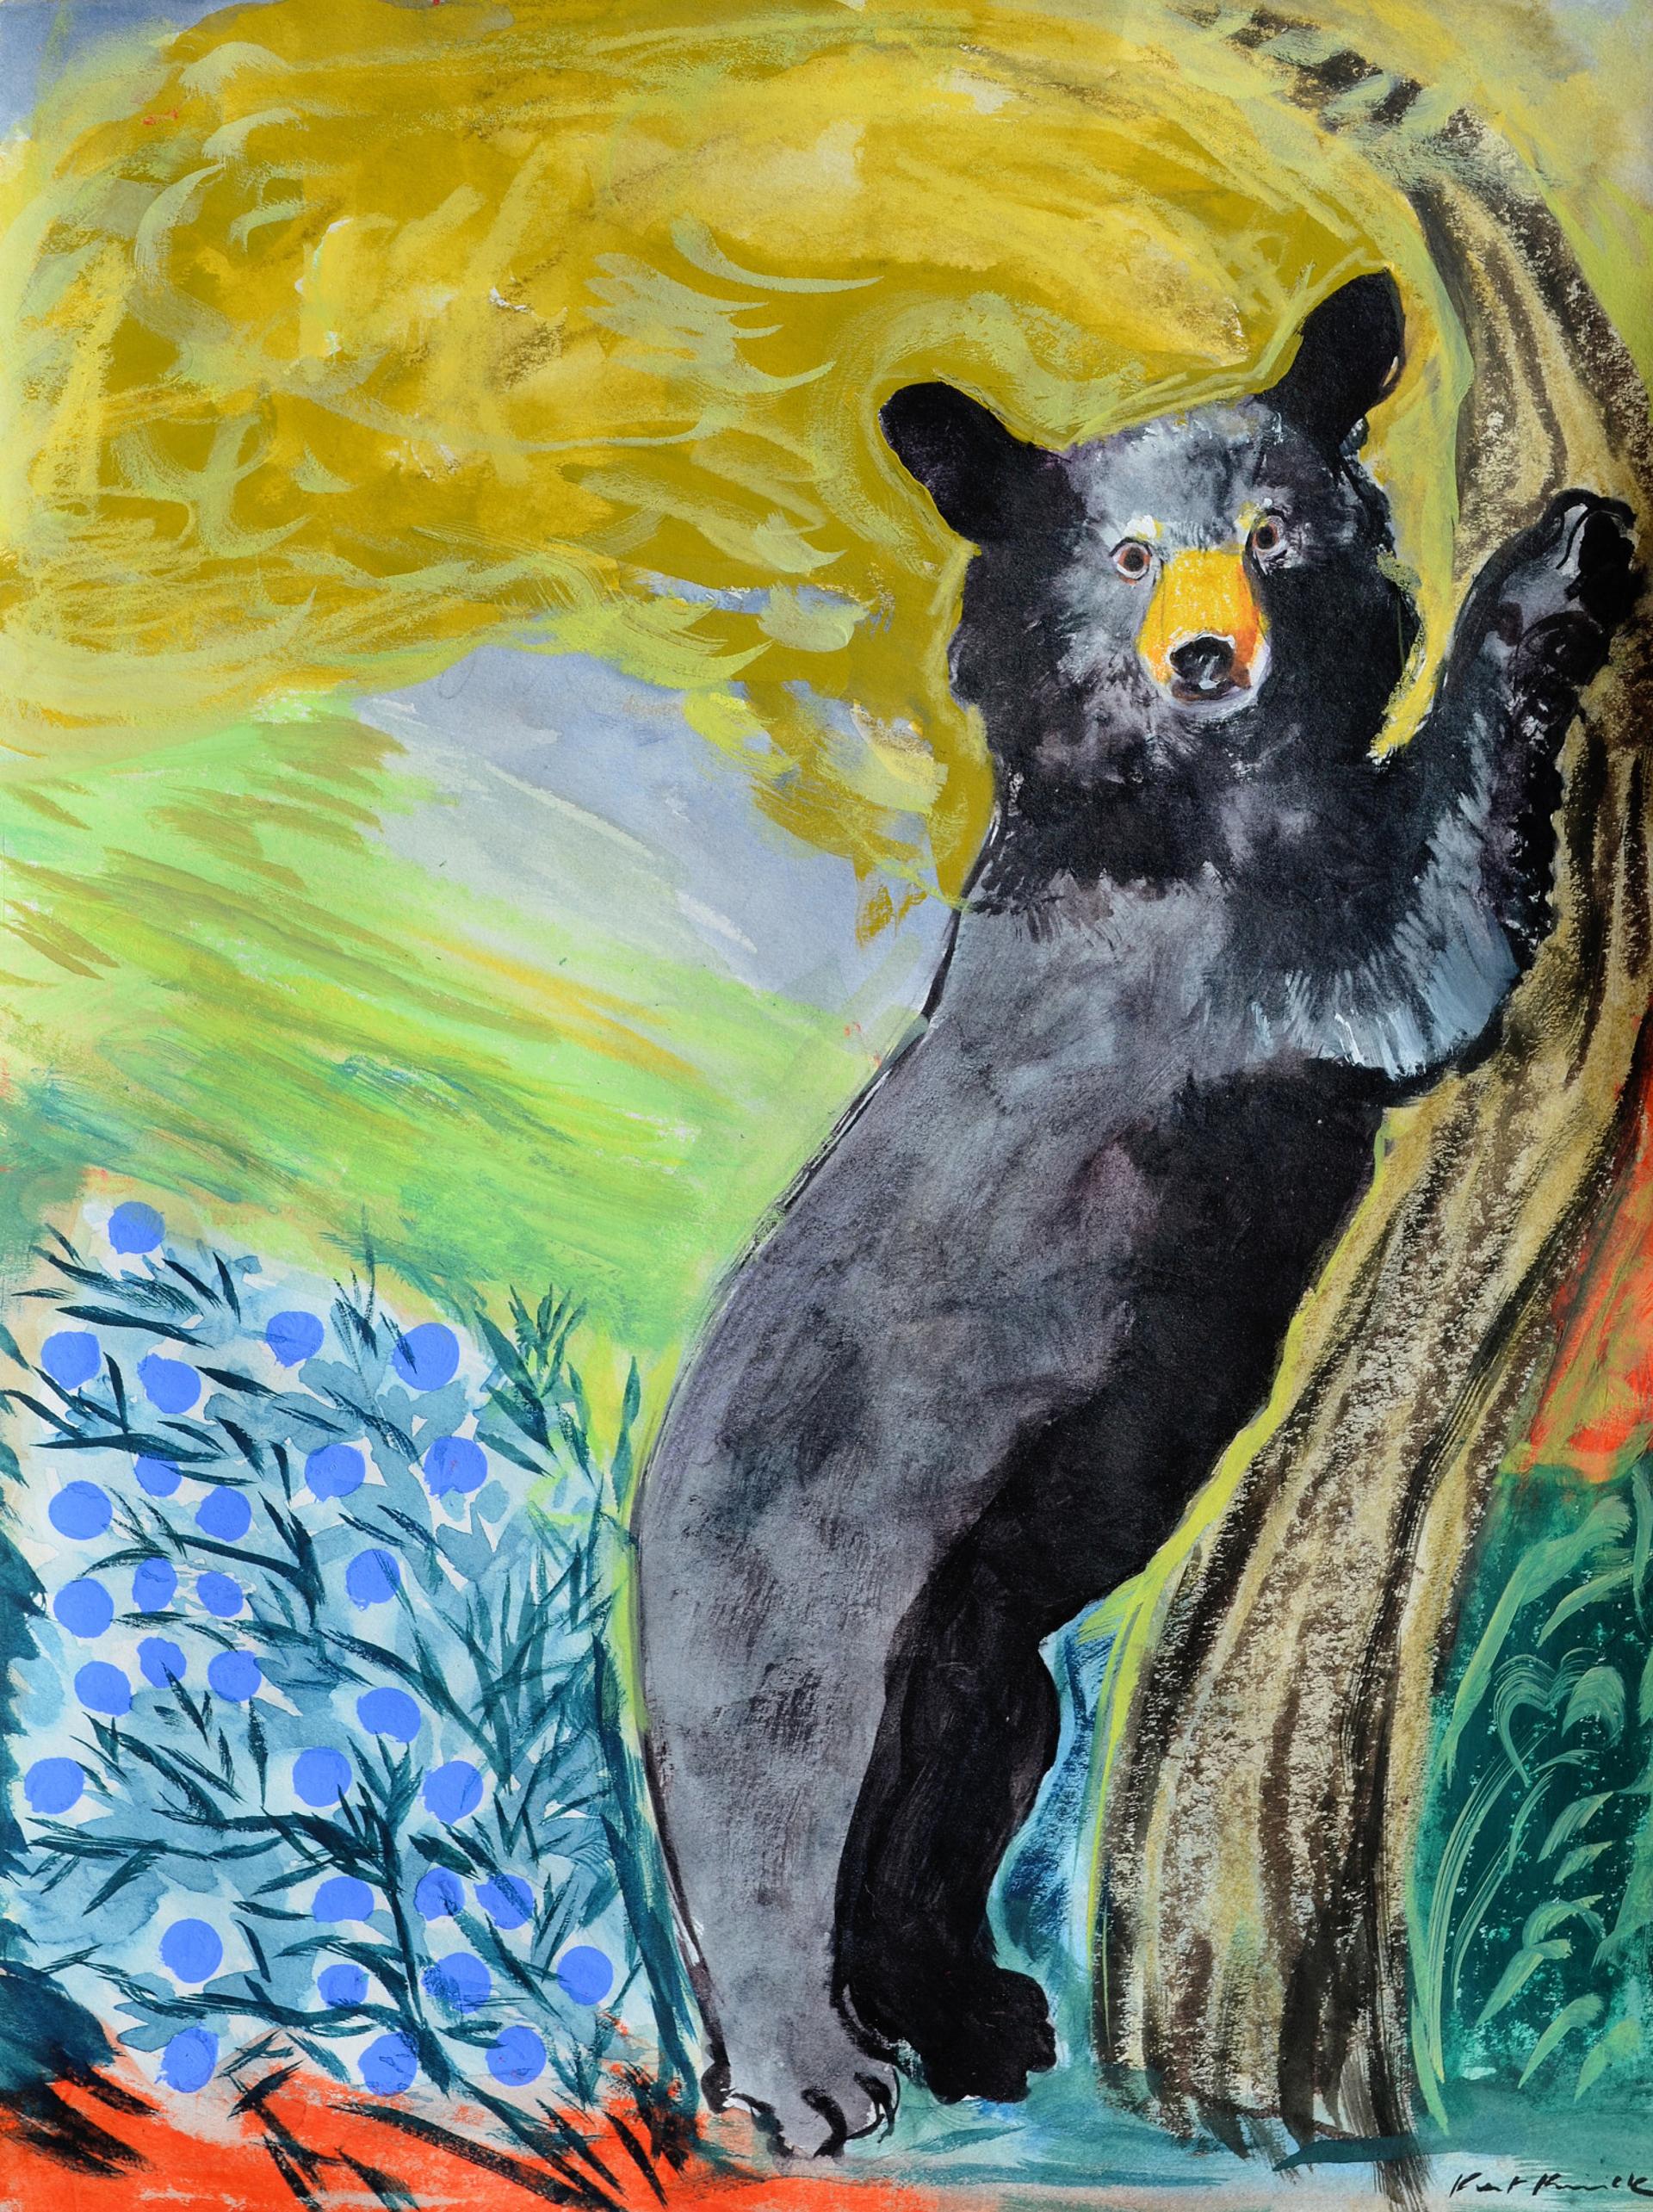 Black Bear by Kat Kinnick